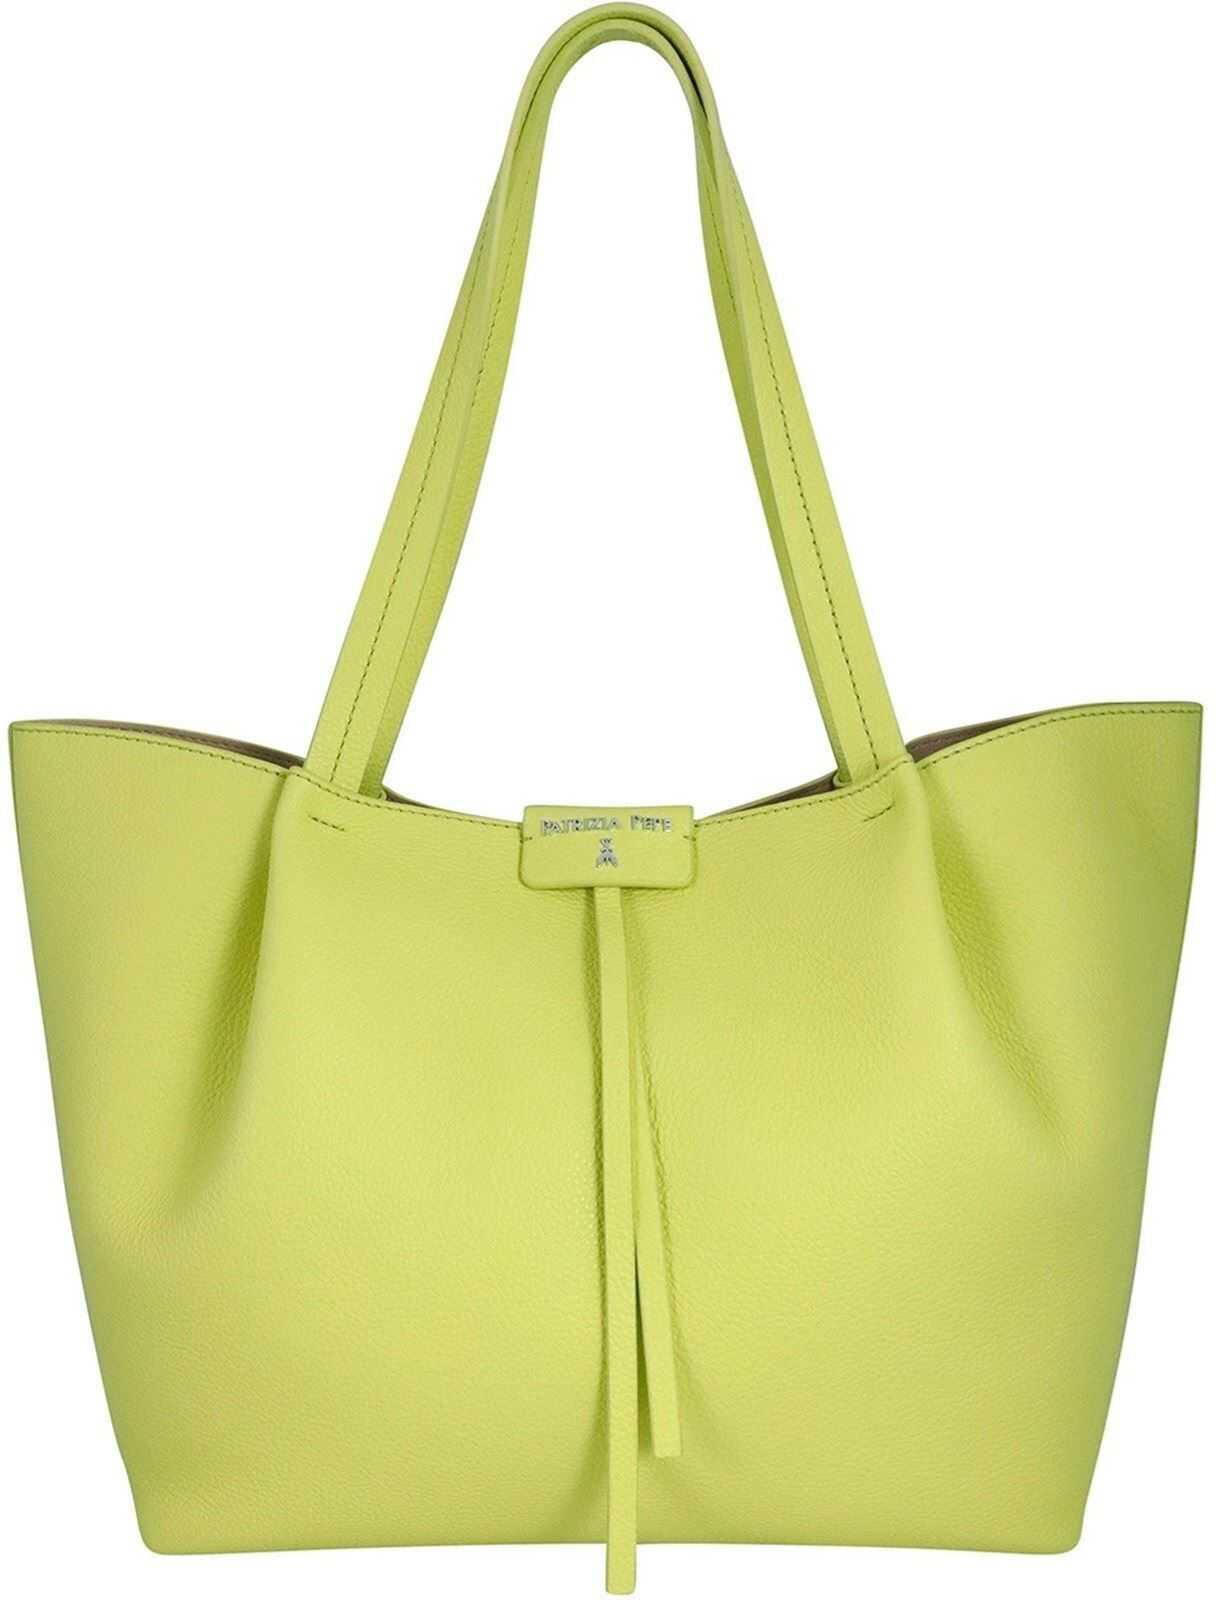 Patrizia Pepe Pepe City Large Leather Tote Bag In Yellow 2V8895A4U8NY397 Yellow imagine b-mall.ro